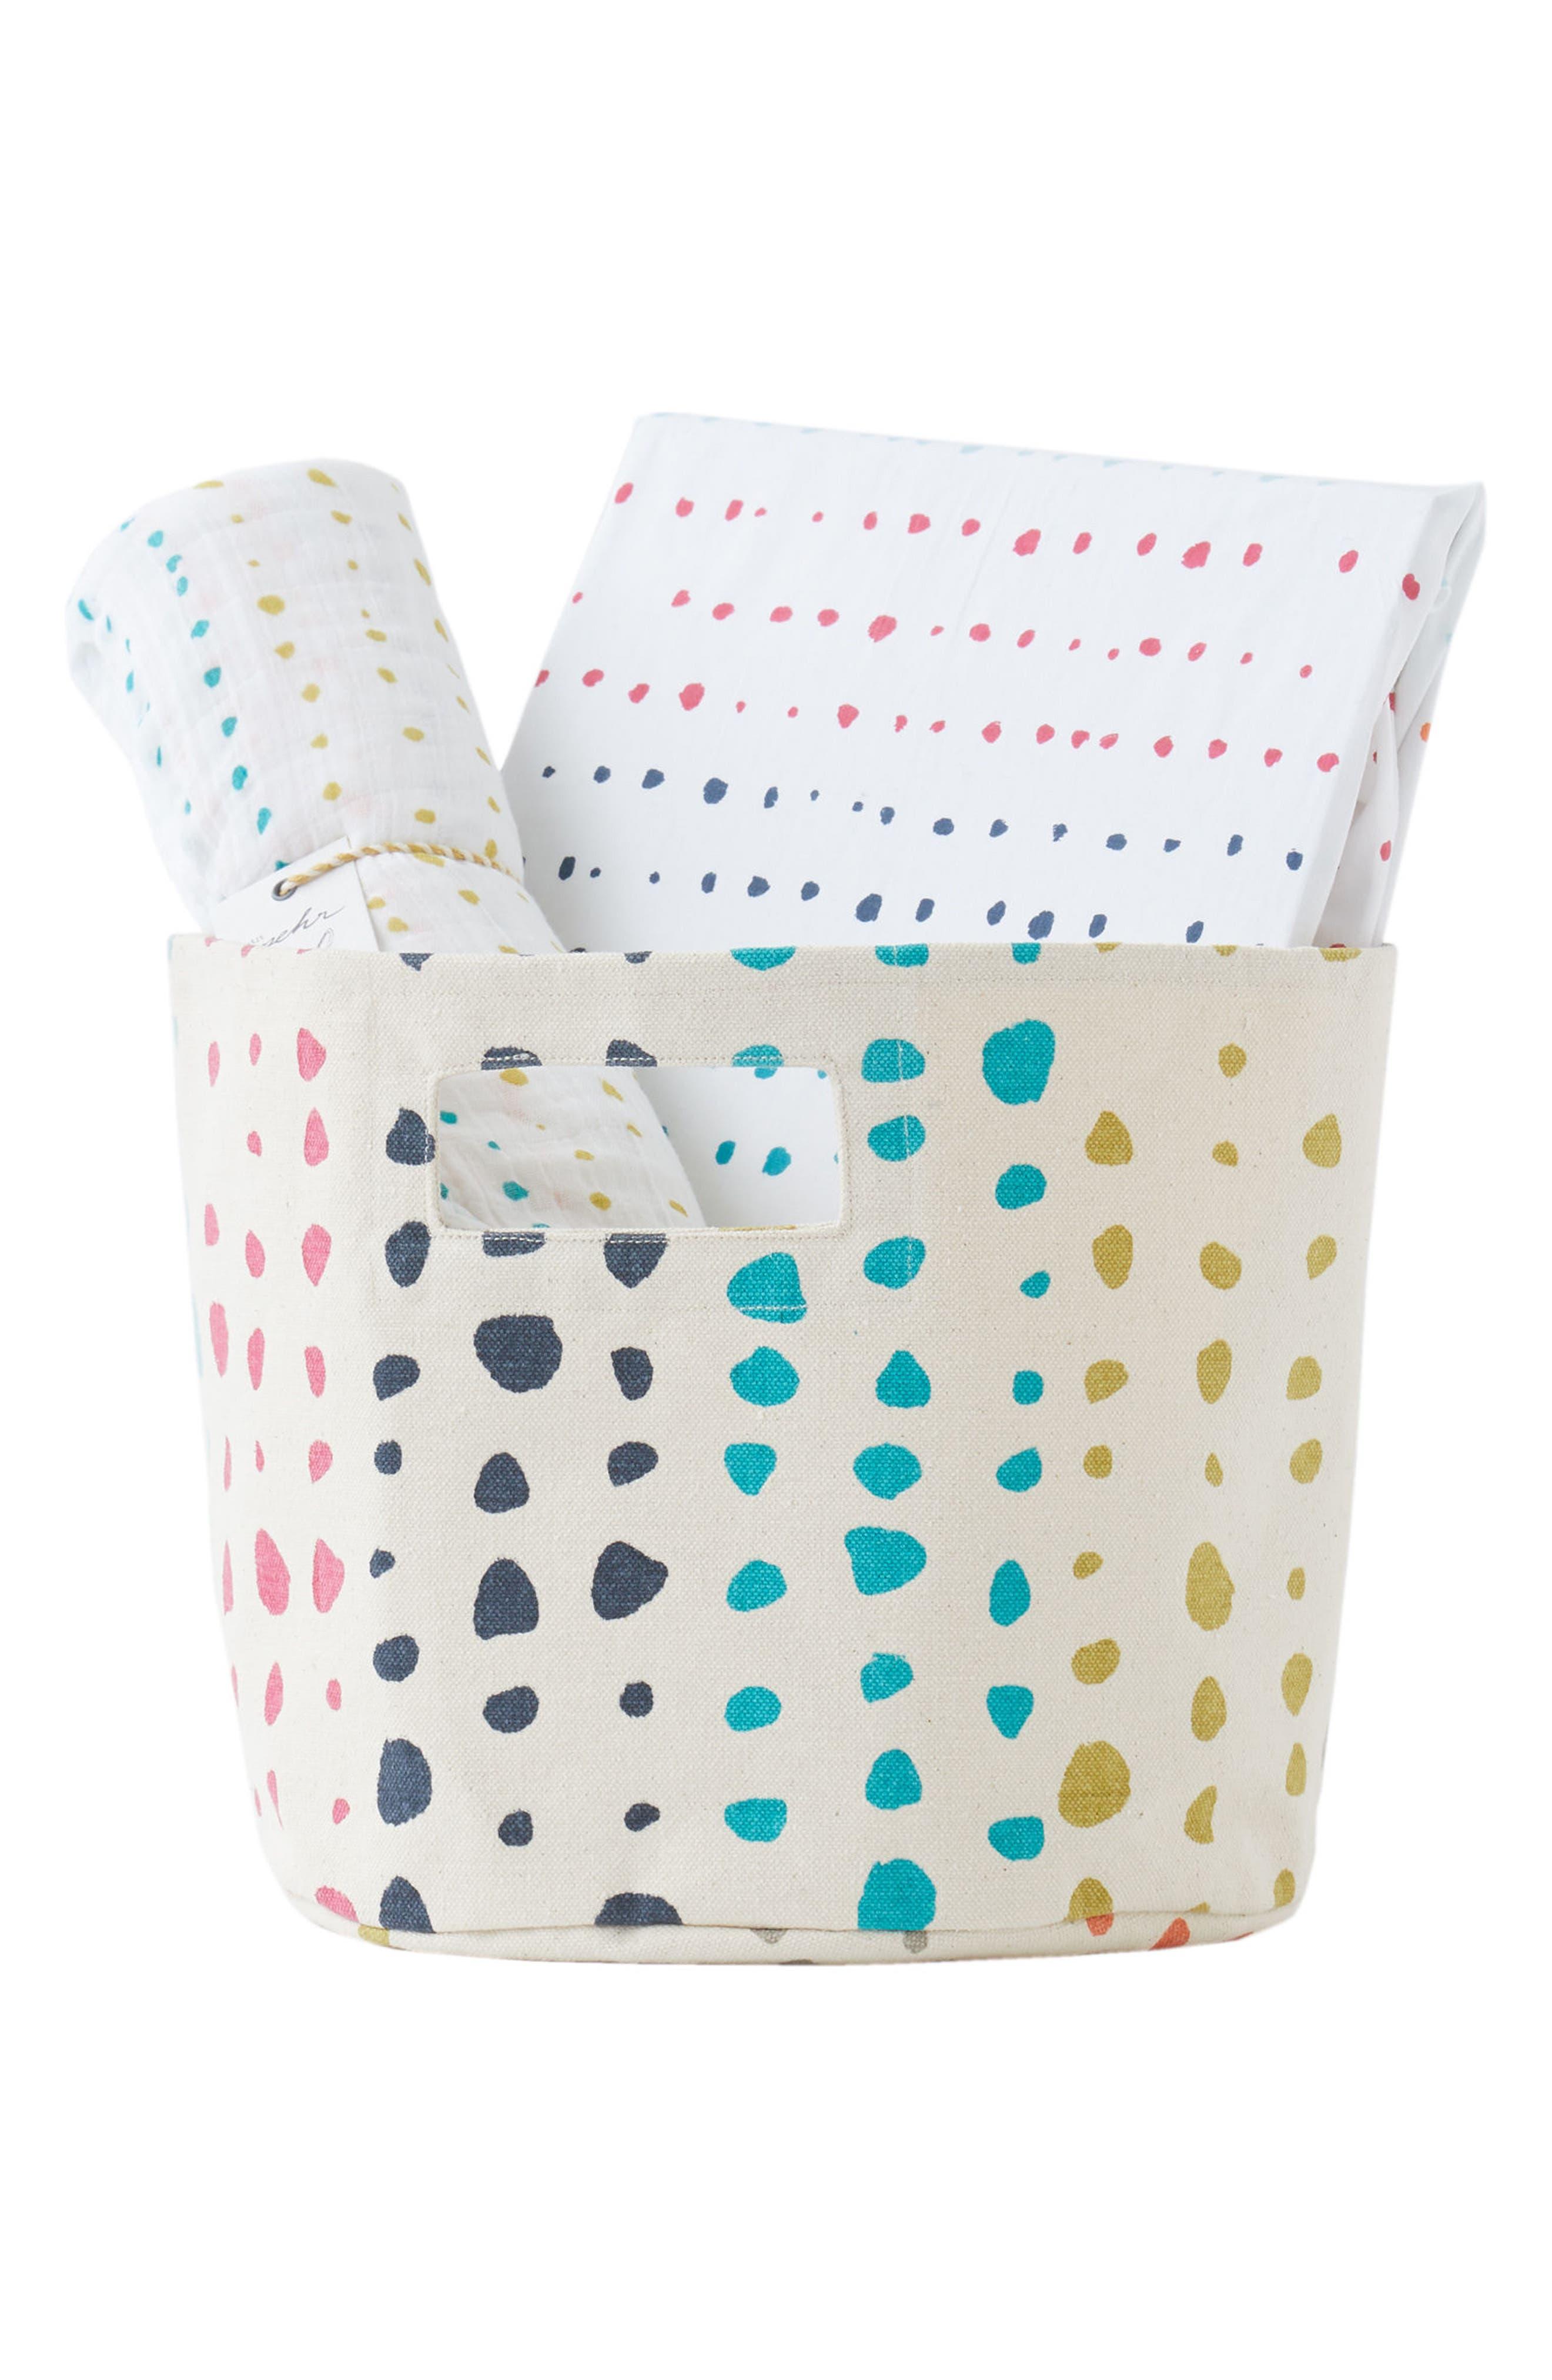 Main Image - Petit Pehr Painted Dots Crib Sheet, Swaddle & Bin Set